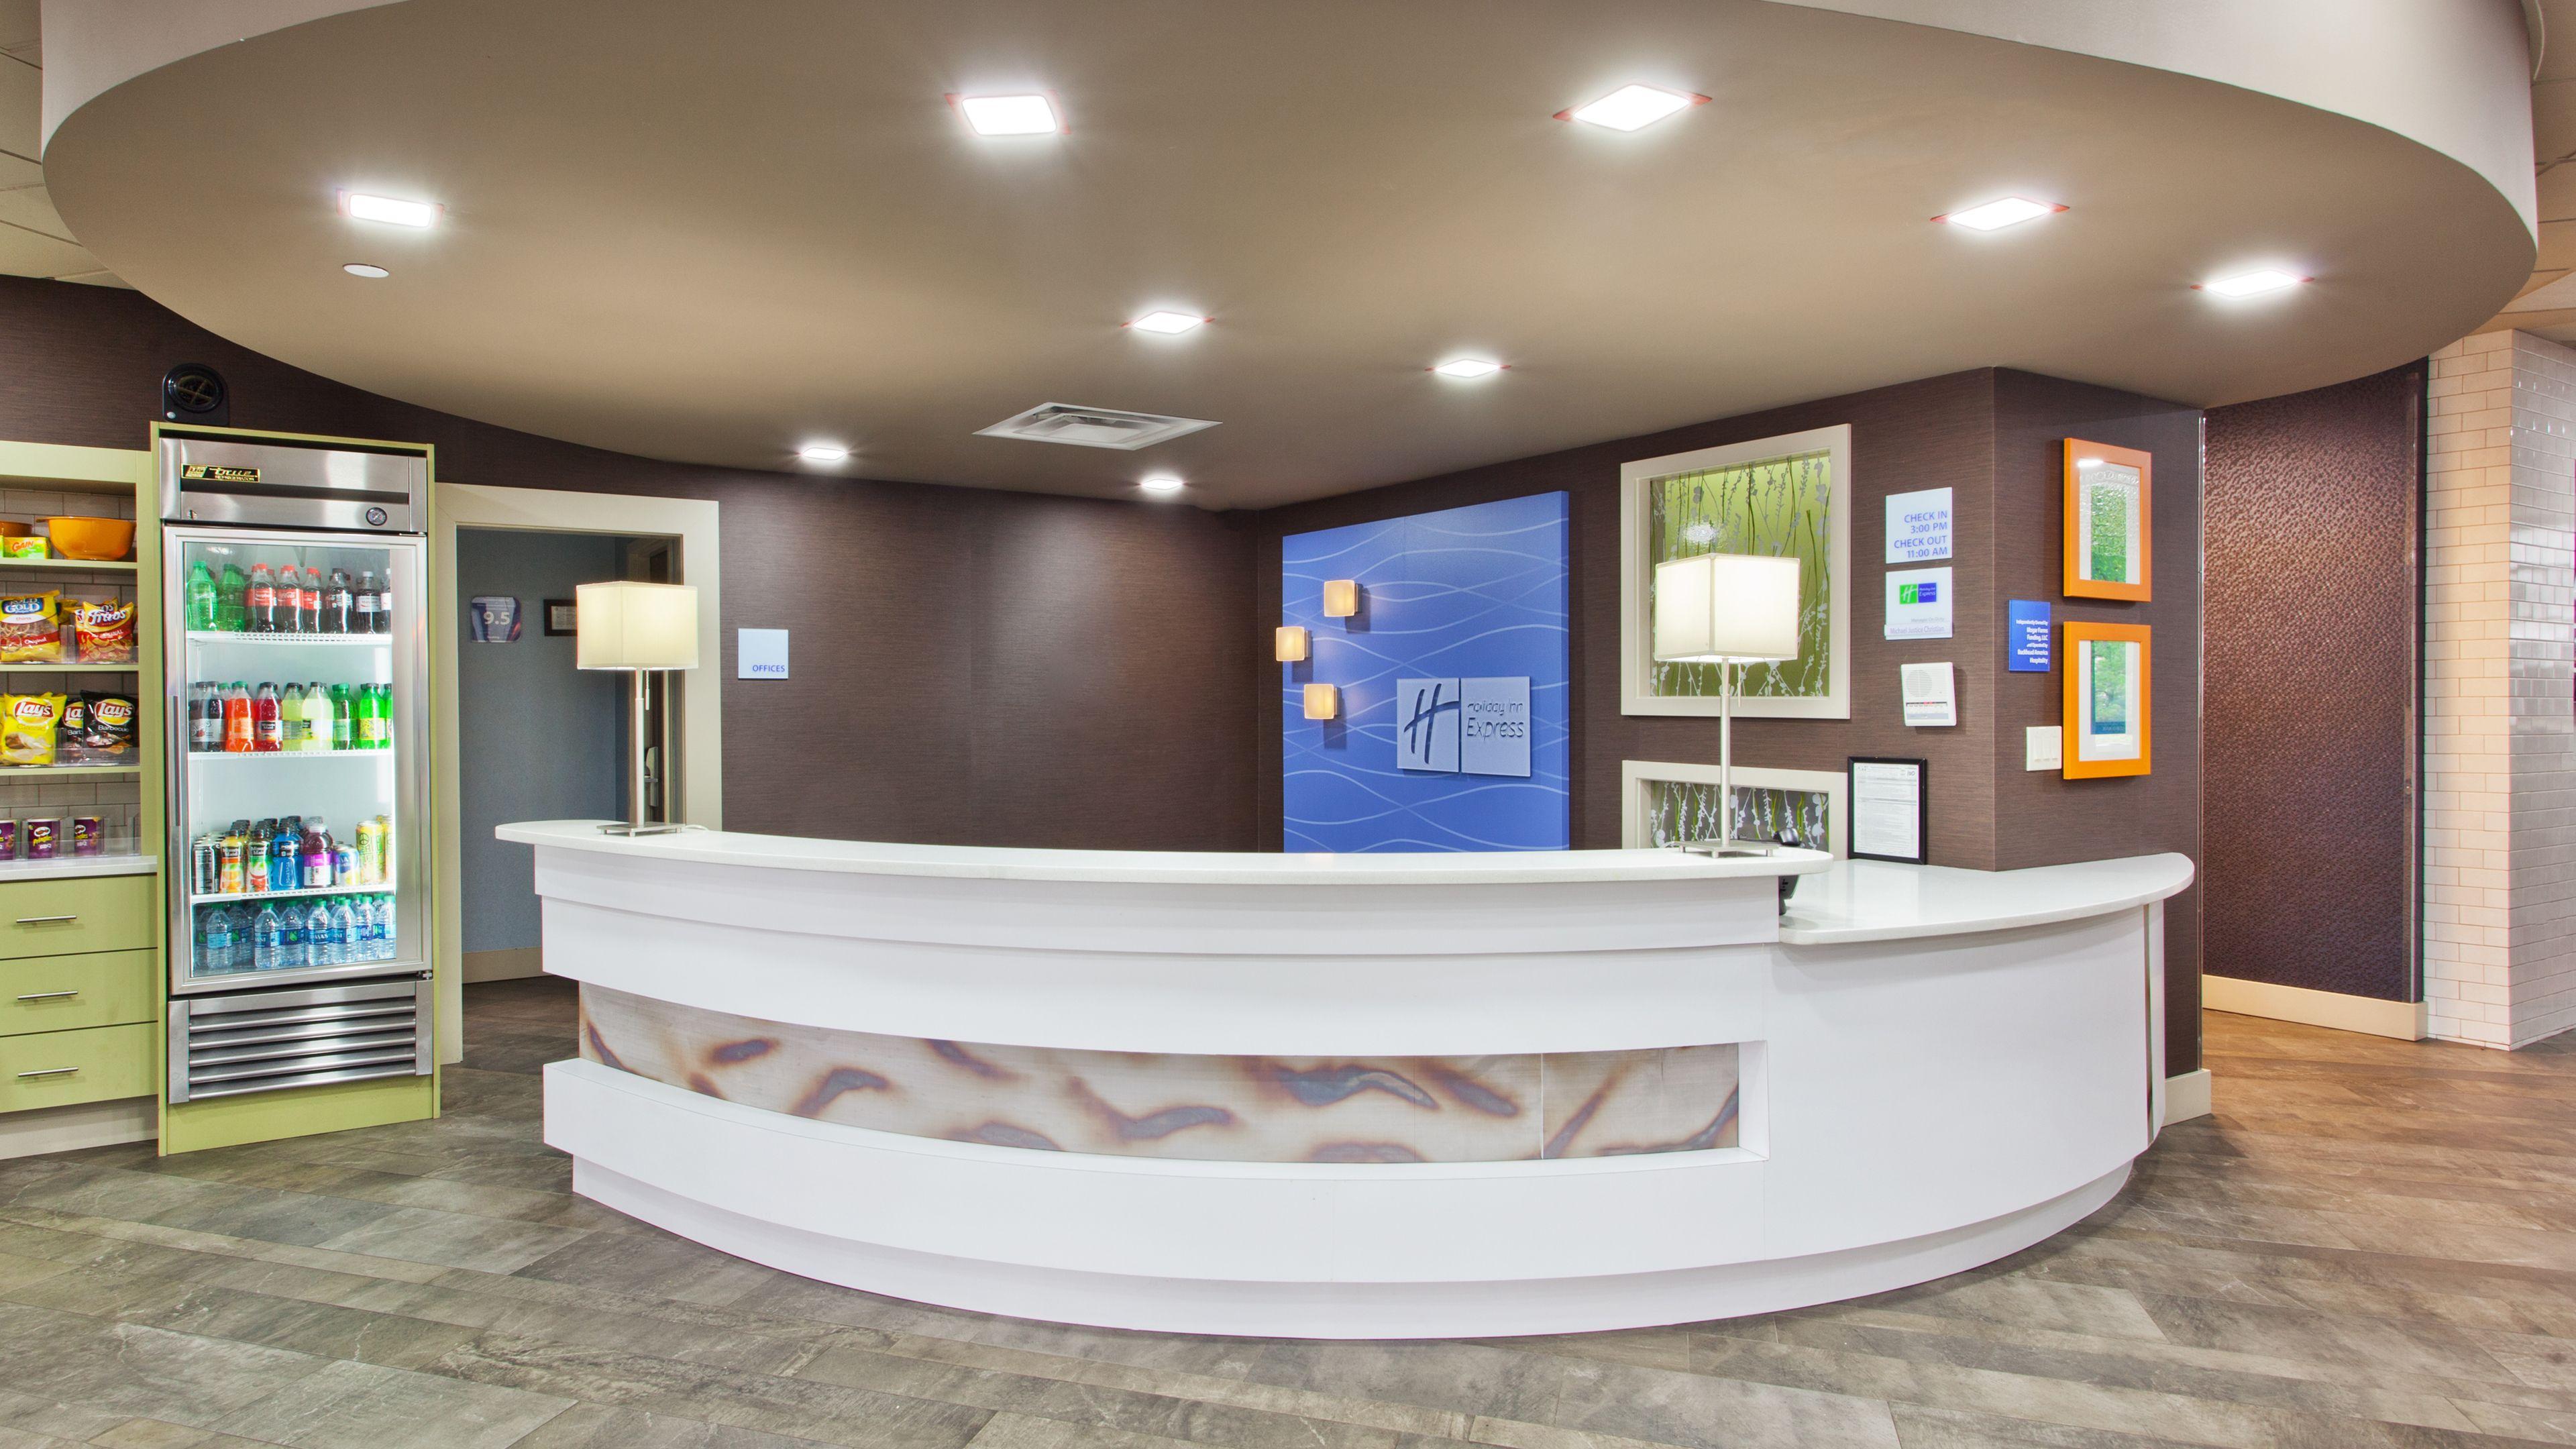 Holiday Inn Express Atlanta Galleria-Ballpark Area image 7